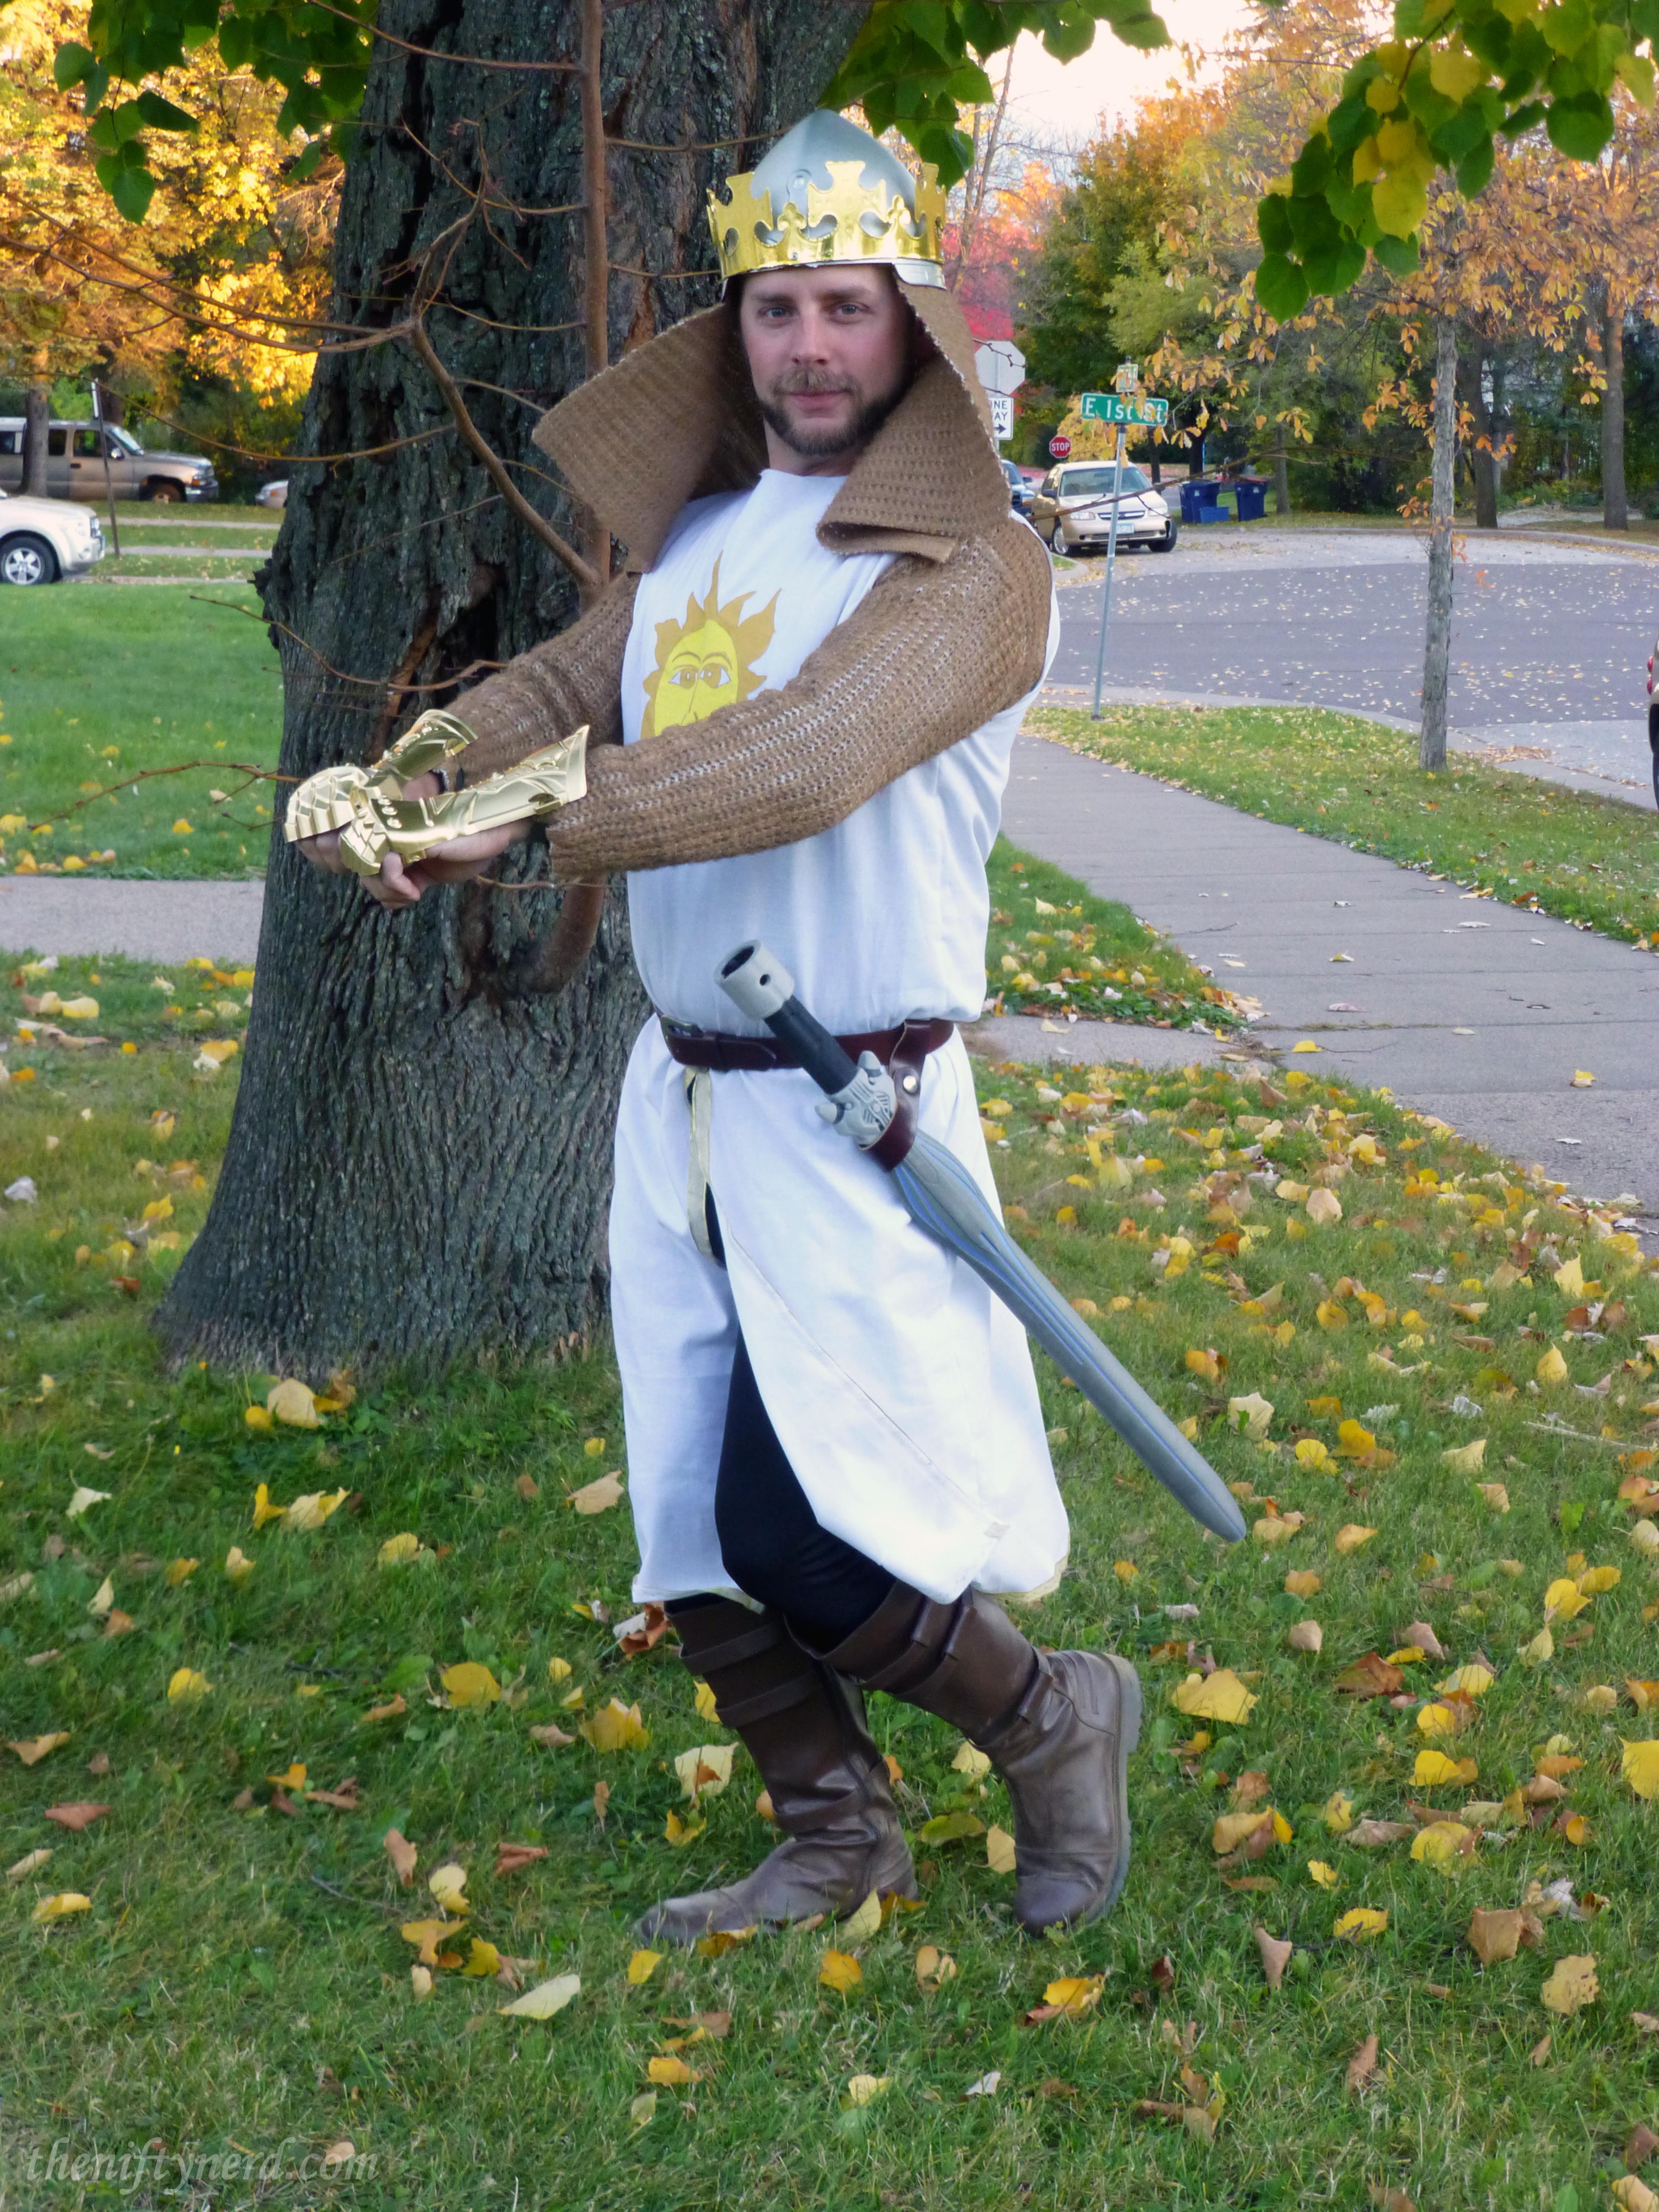 Monty Python King Arthur costume